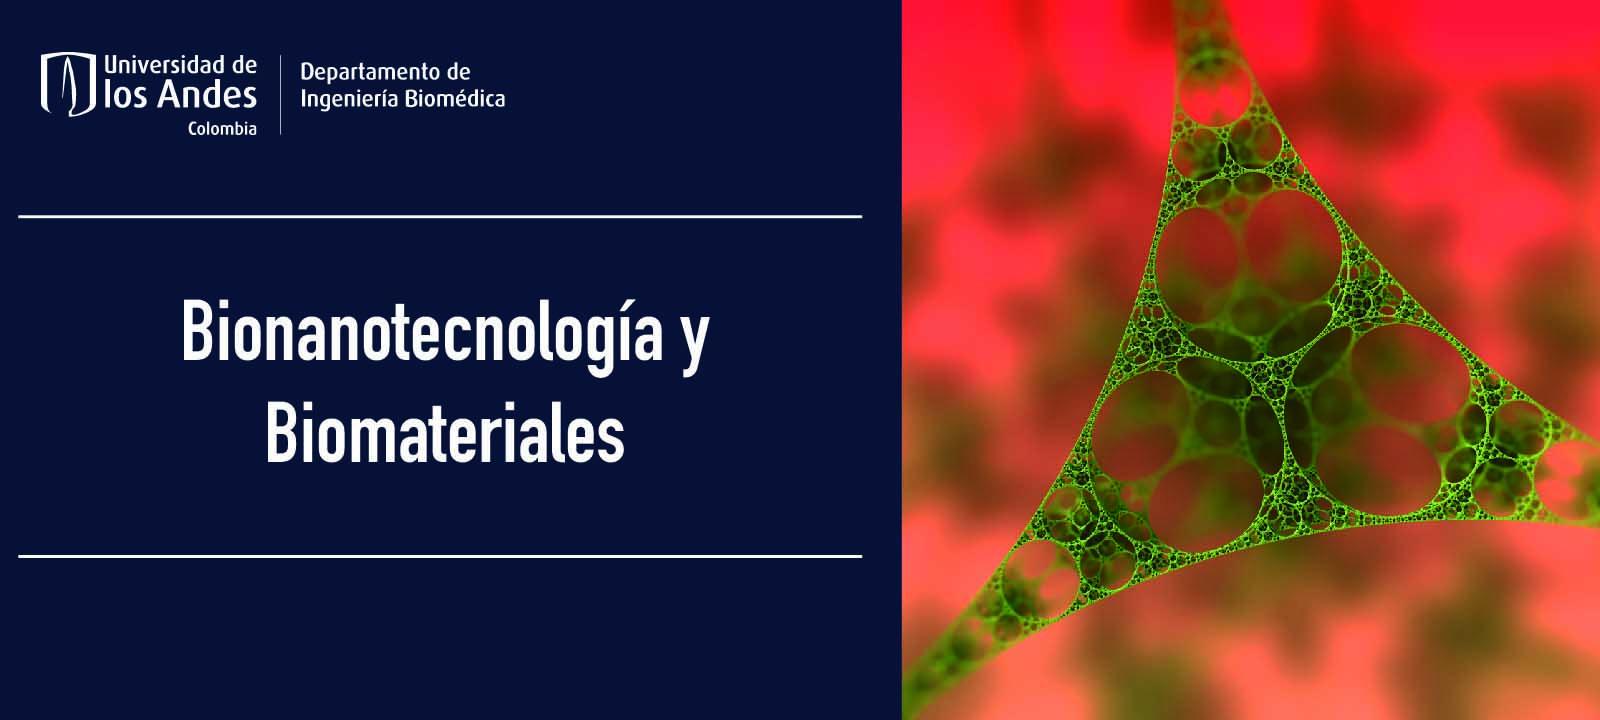 Nanobiomaterales e Ingeniería Biomólecular